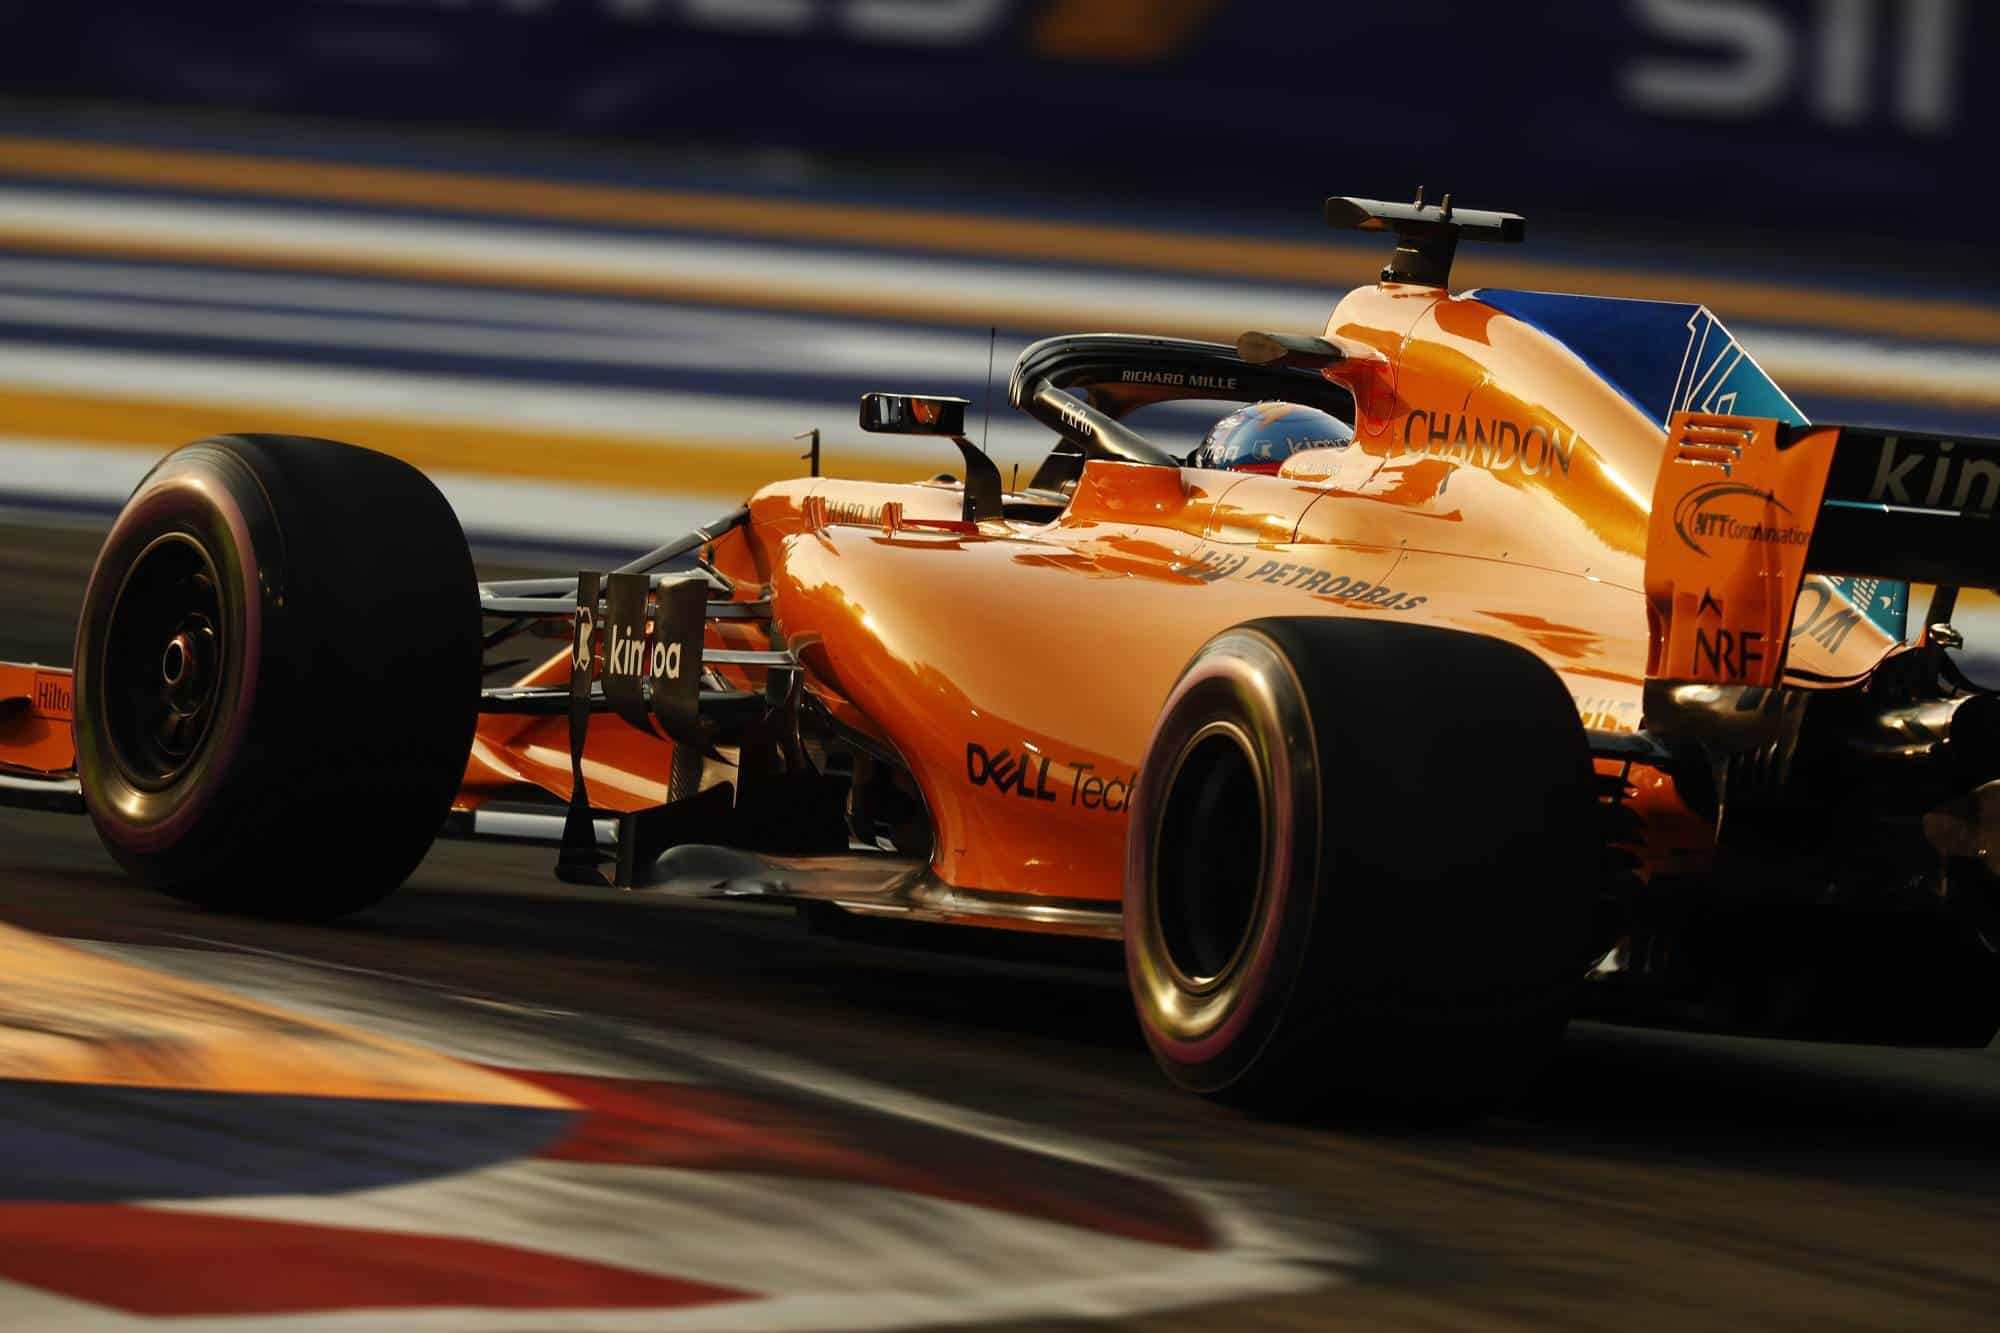 Alonso McLaren Singapore GP F1 2018 Photo McLaren